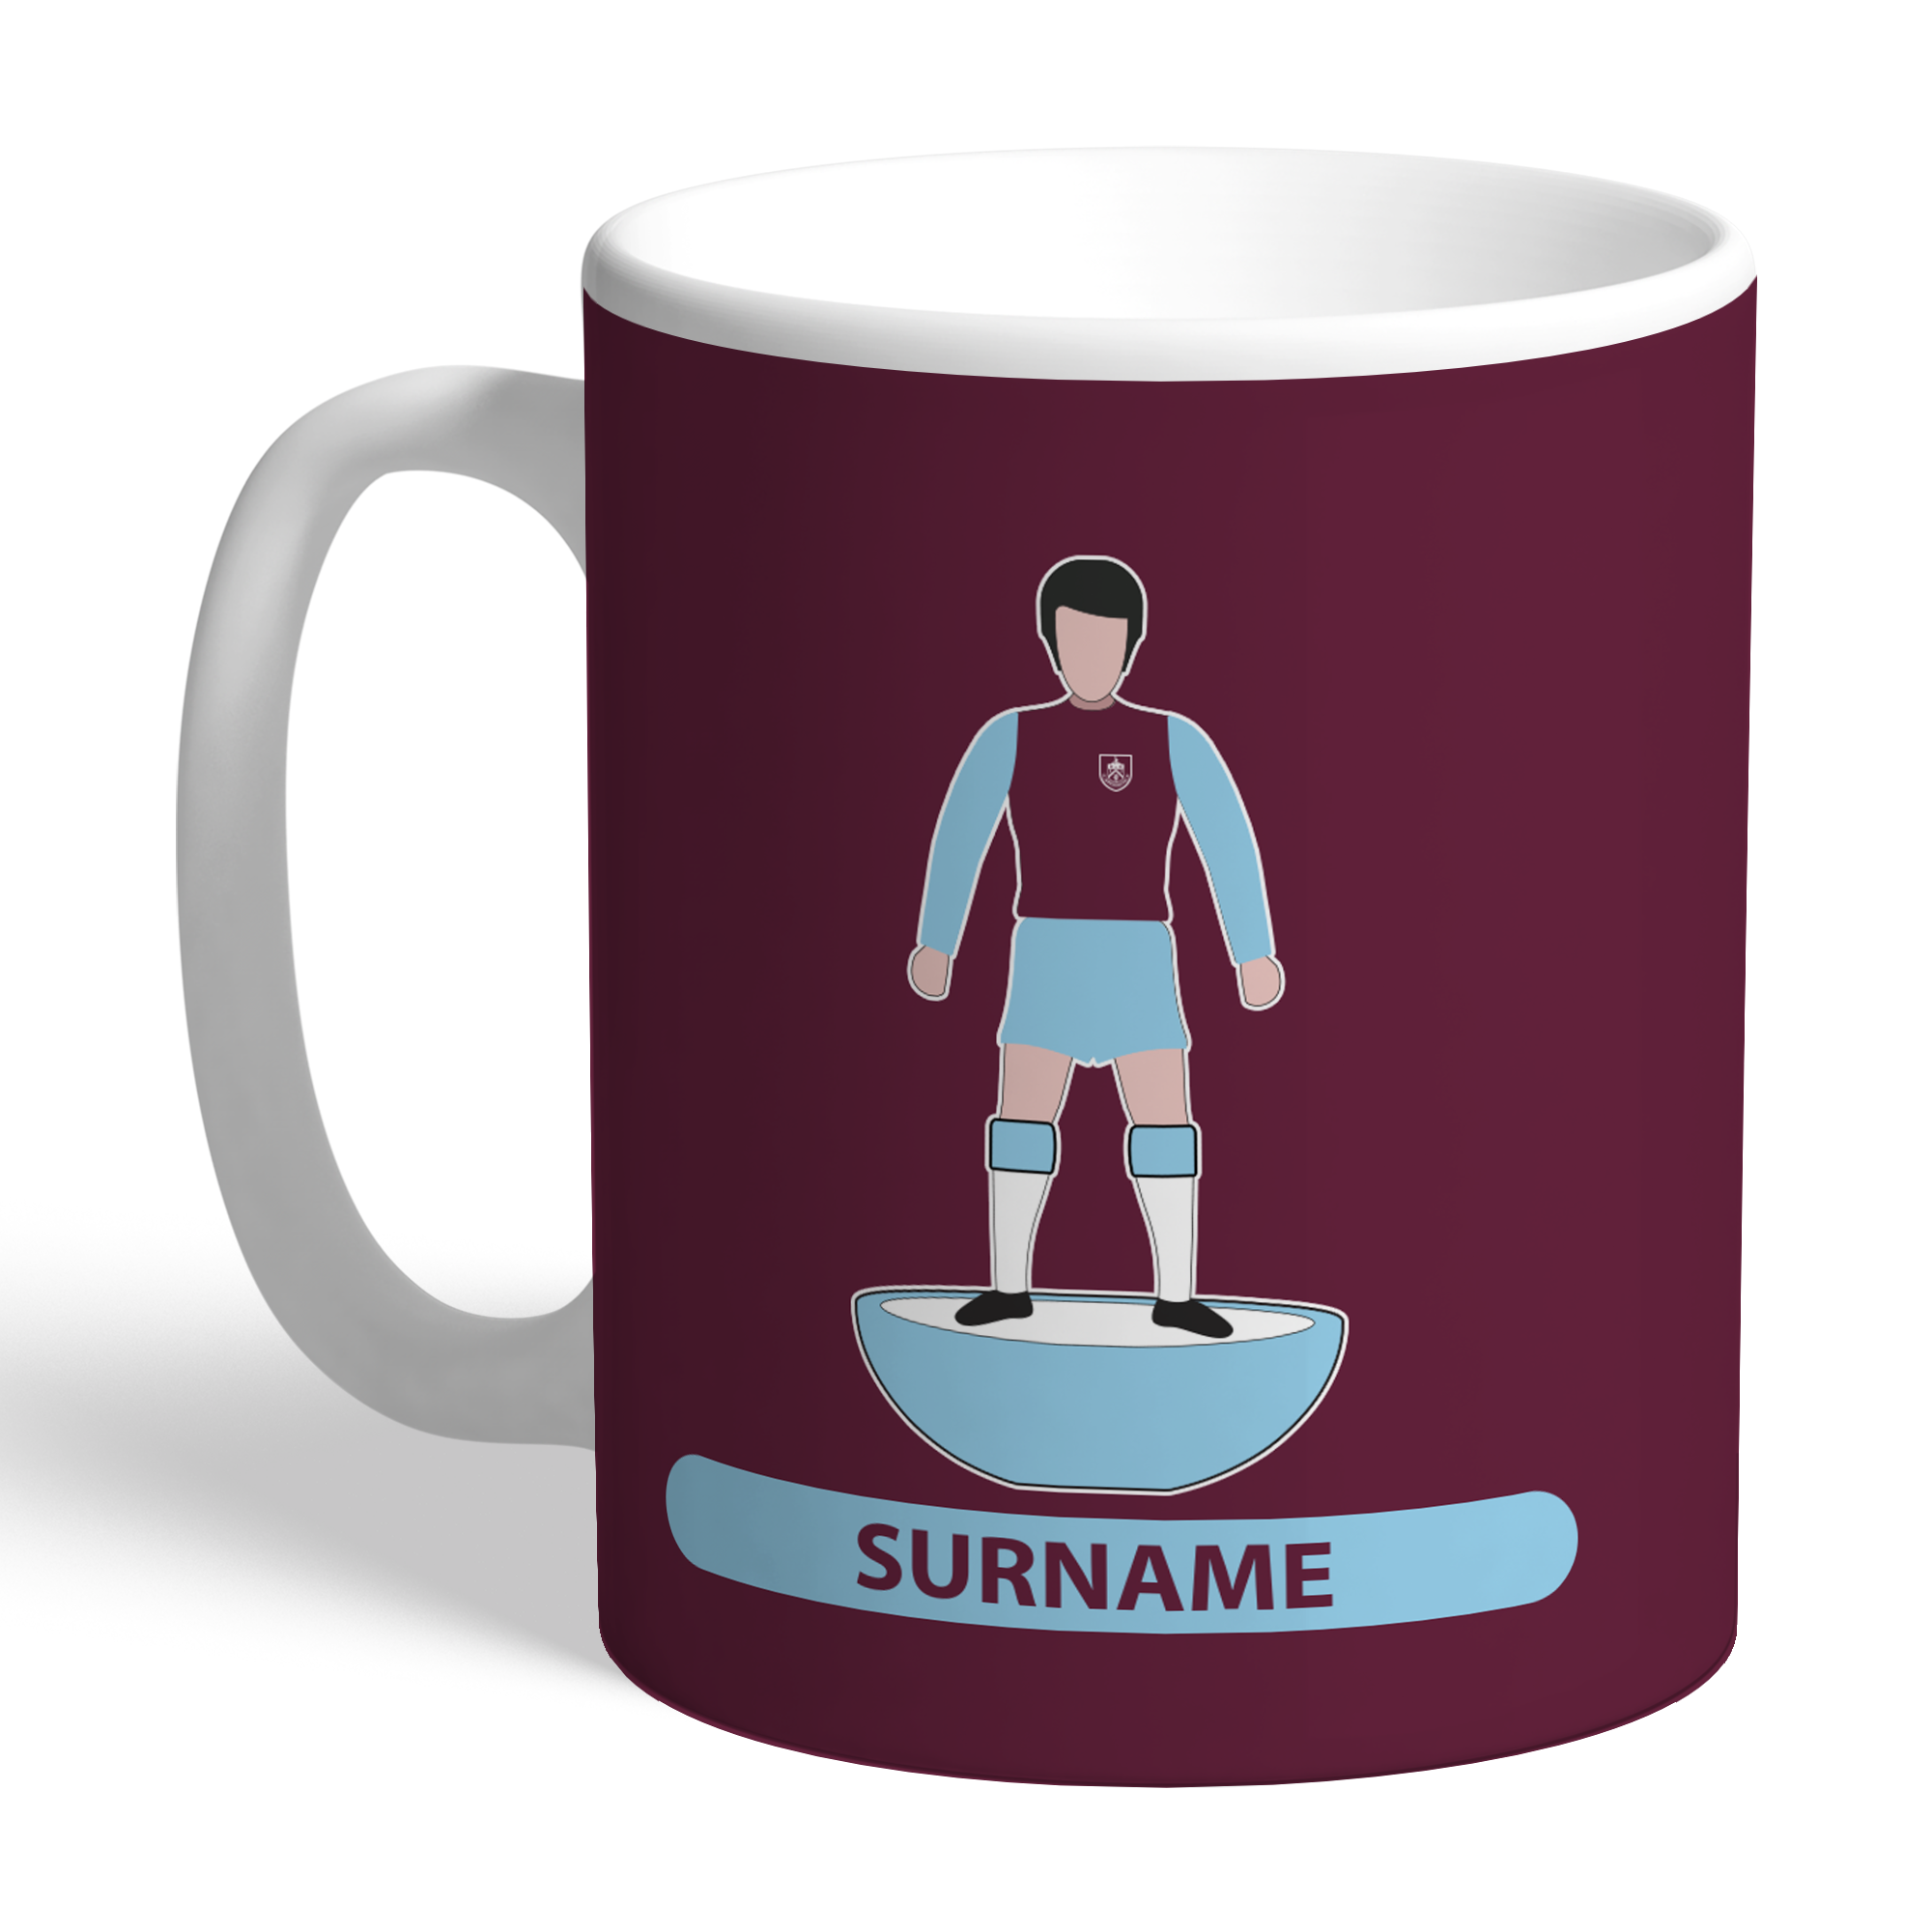 Burnley FC Player Figure Mug